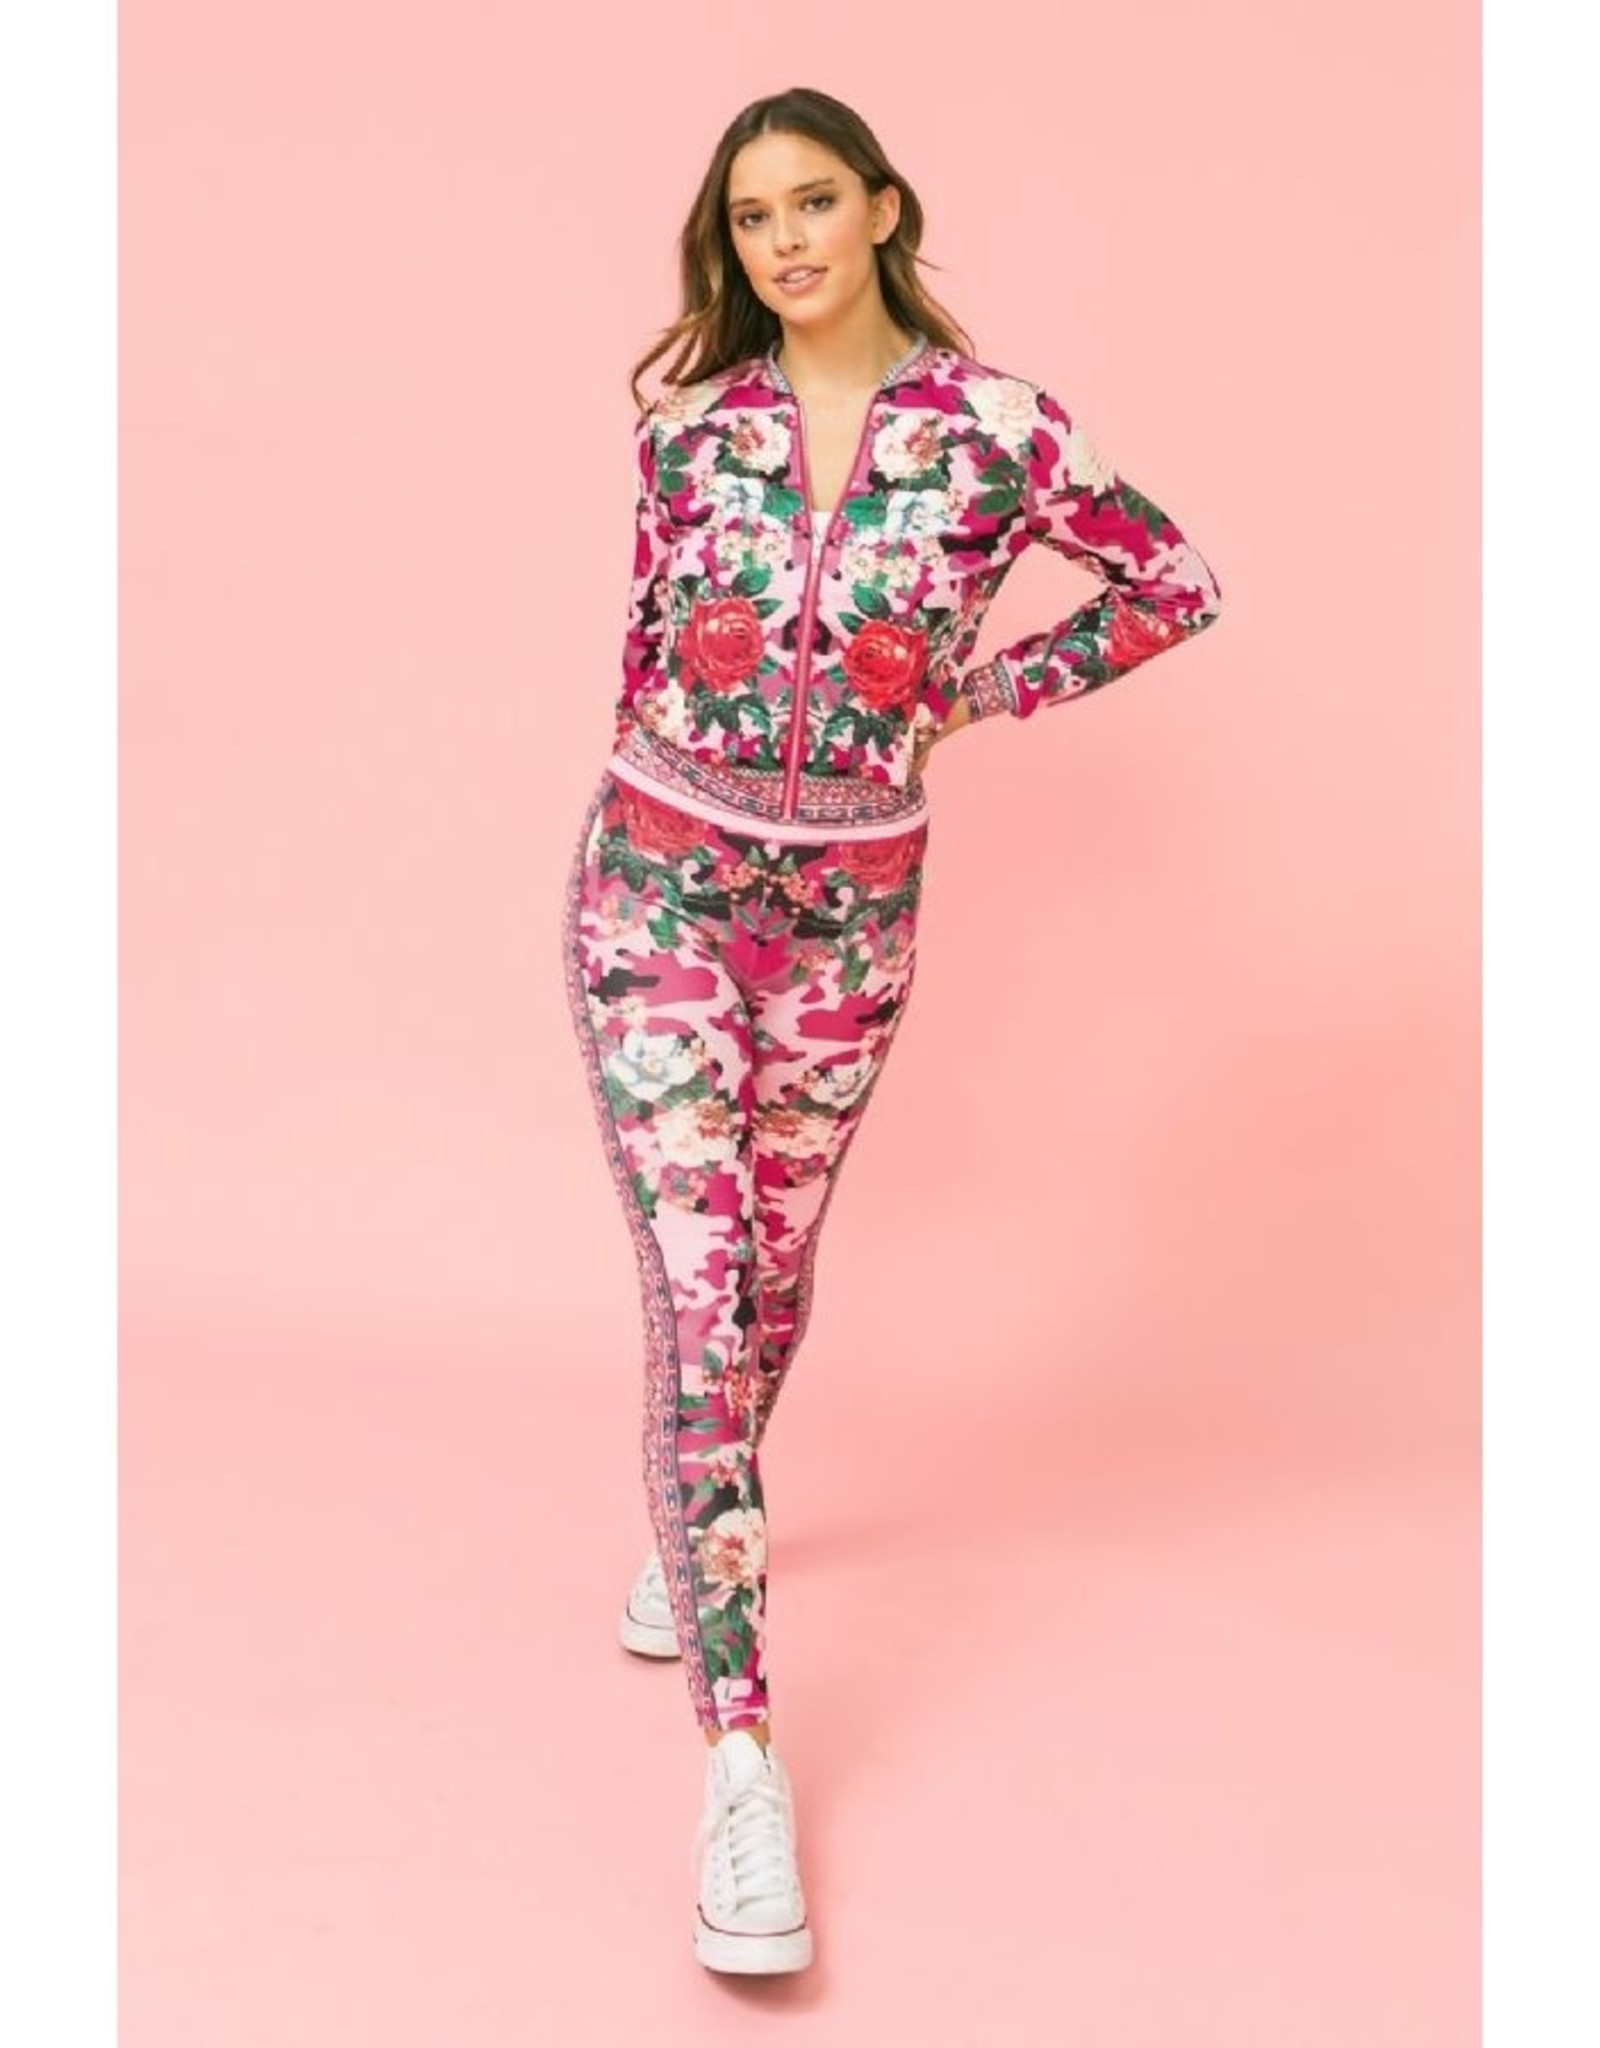 Pink Camo/Floral Track Suit